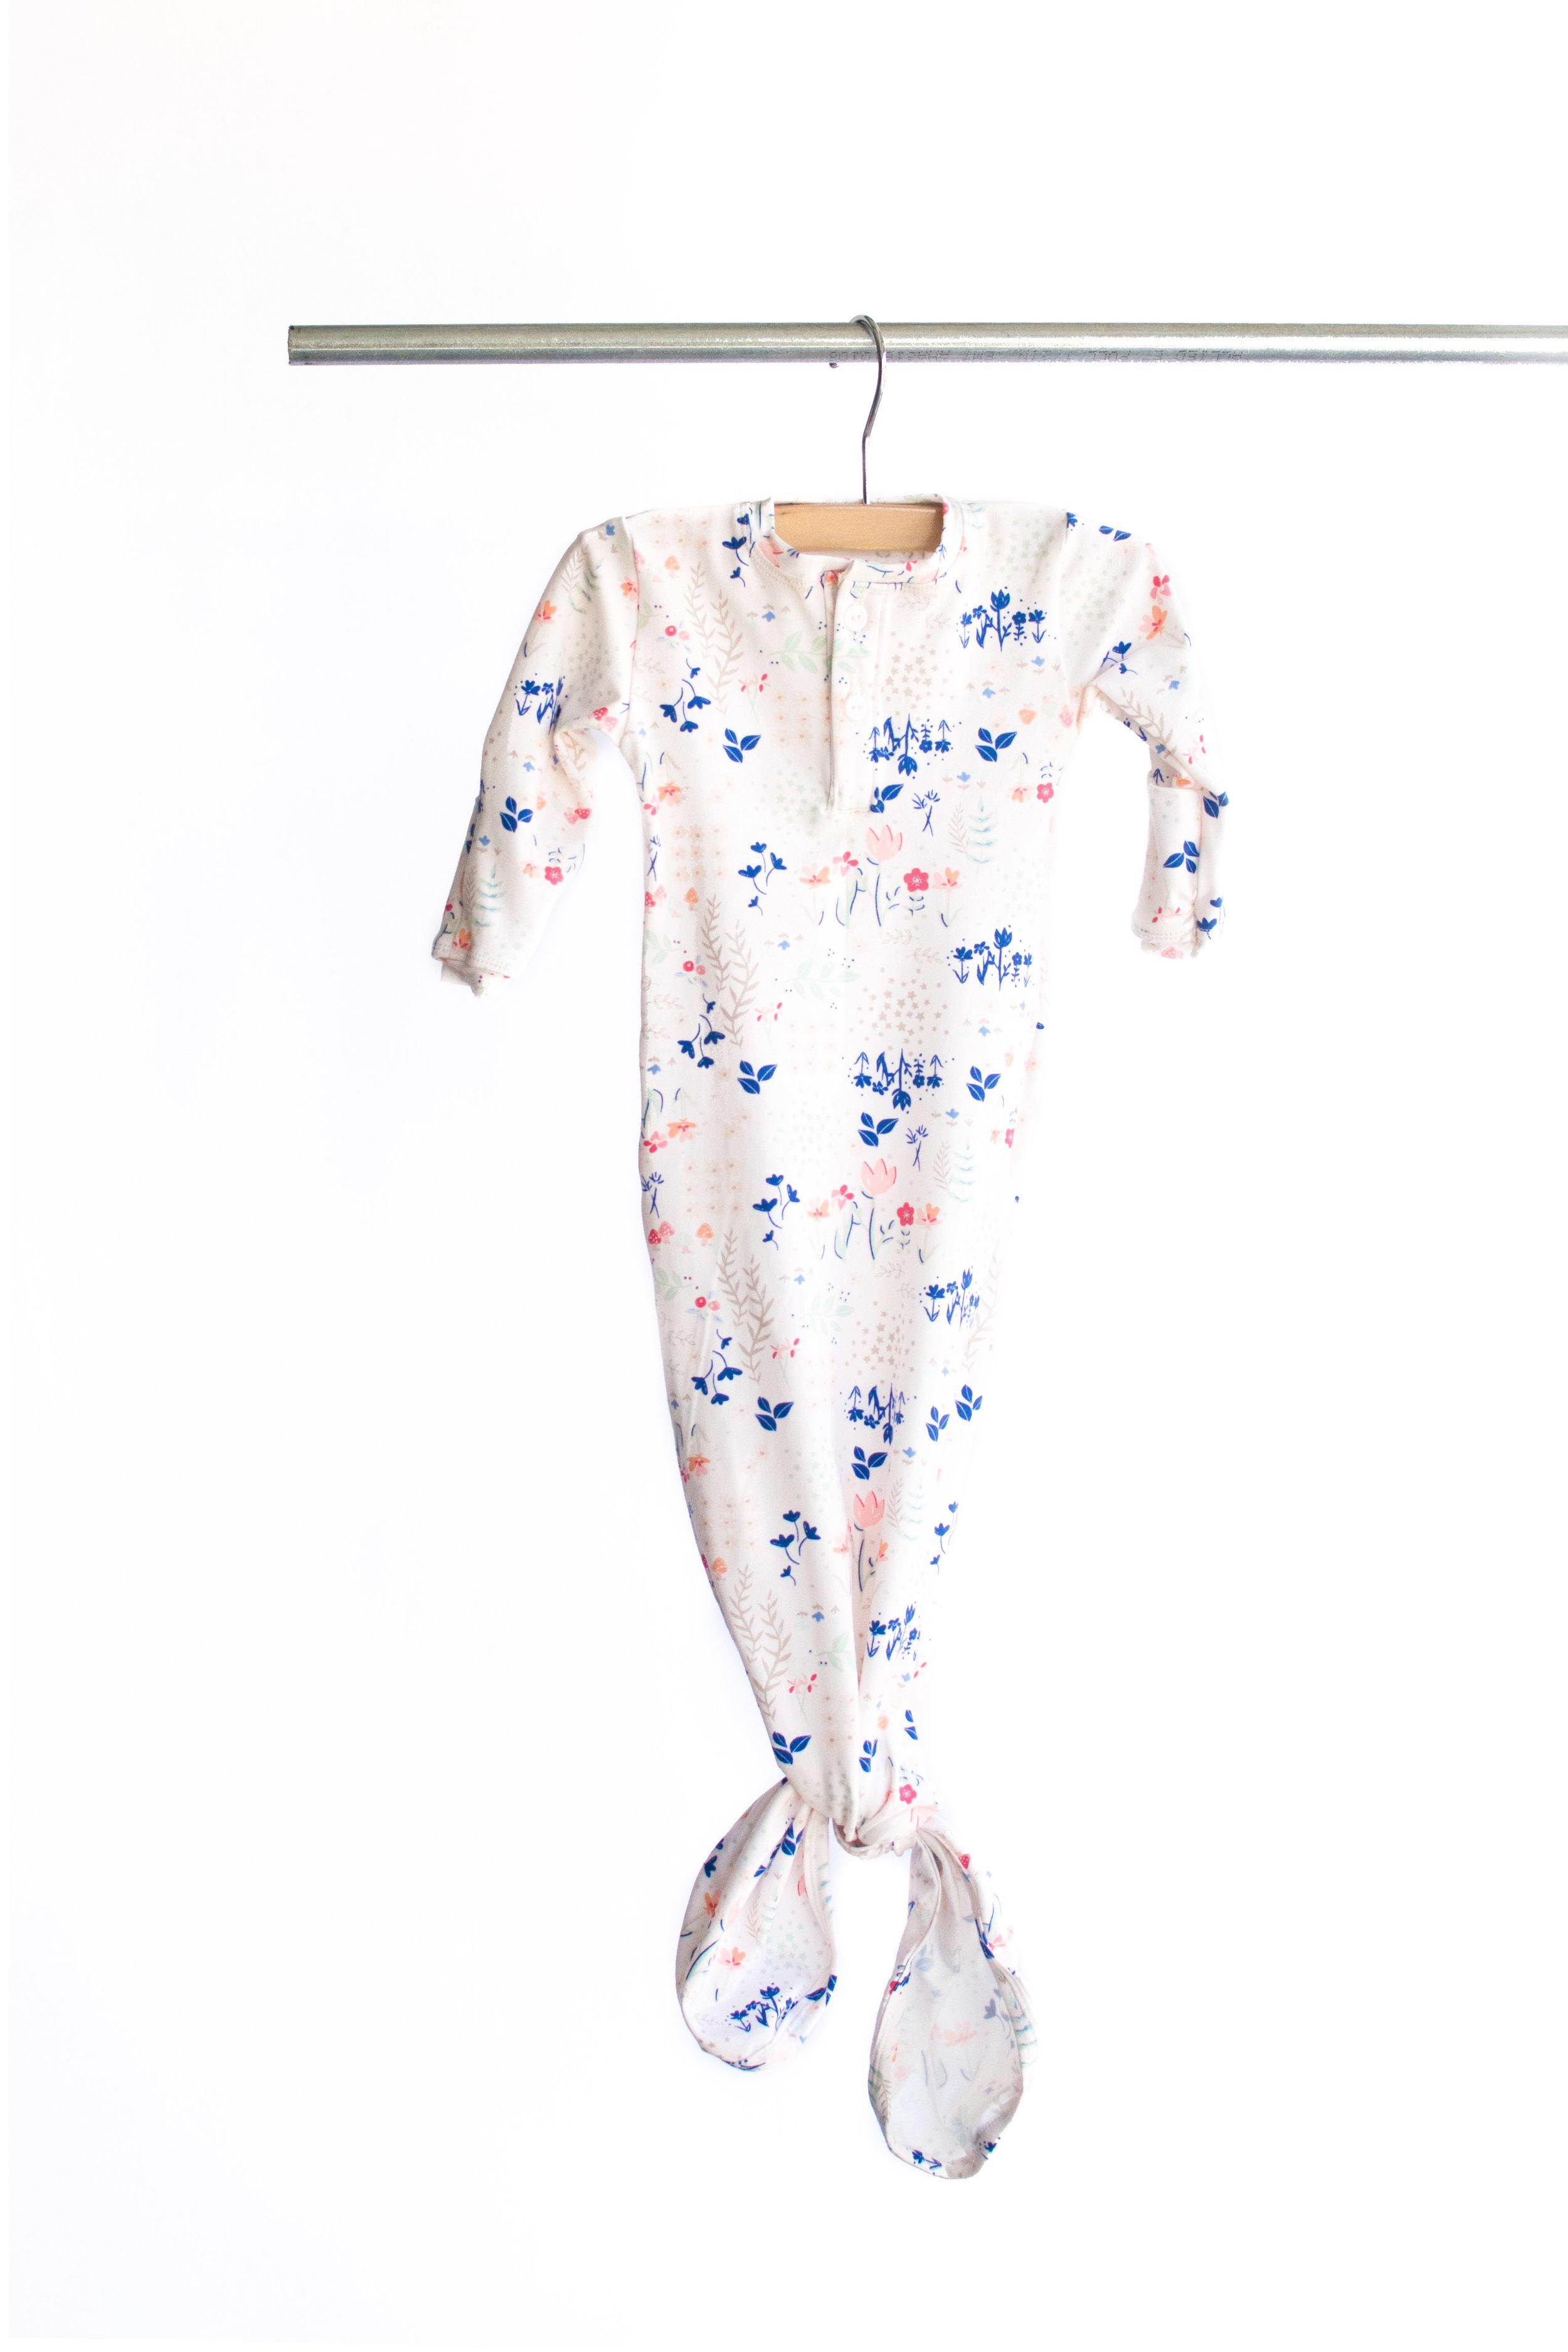 gown7.jpg